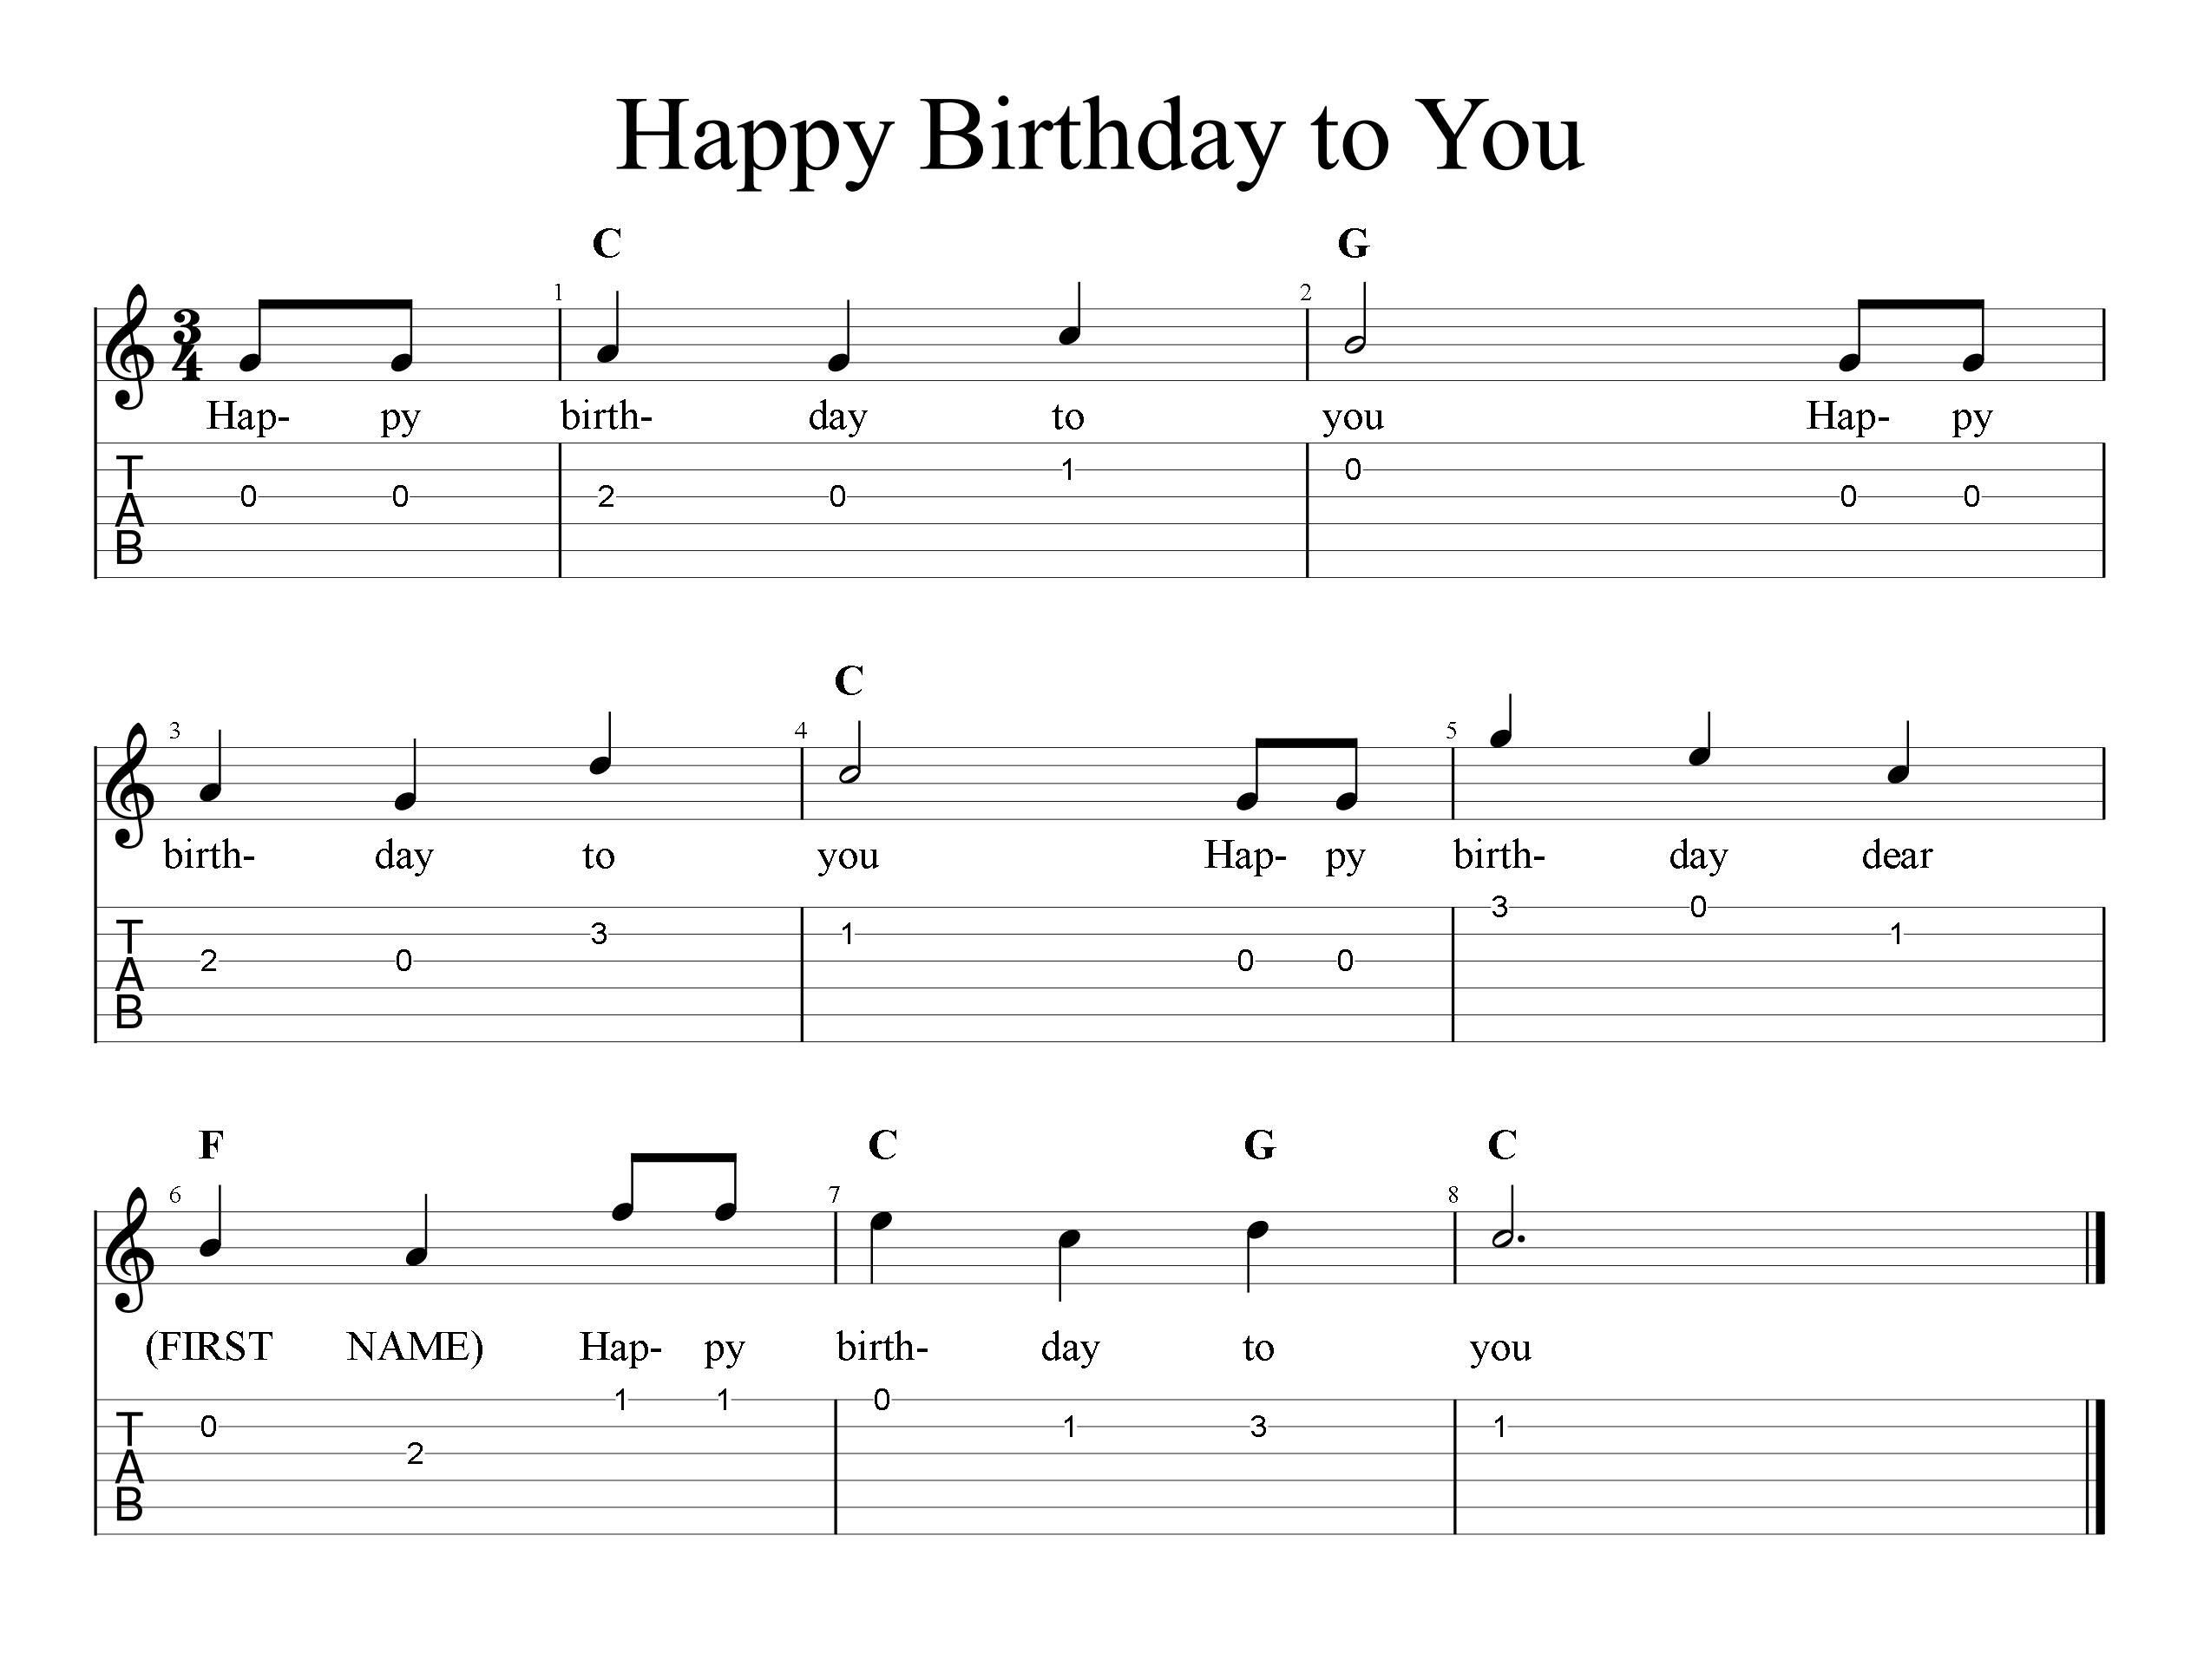 Happy Birthday Tab Sheet Music Freewheelinguitar Com